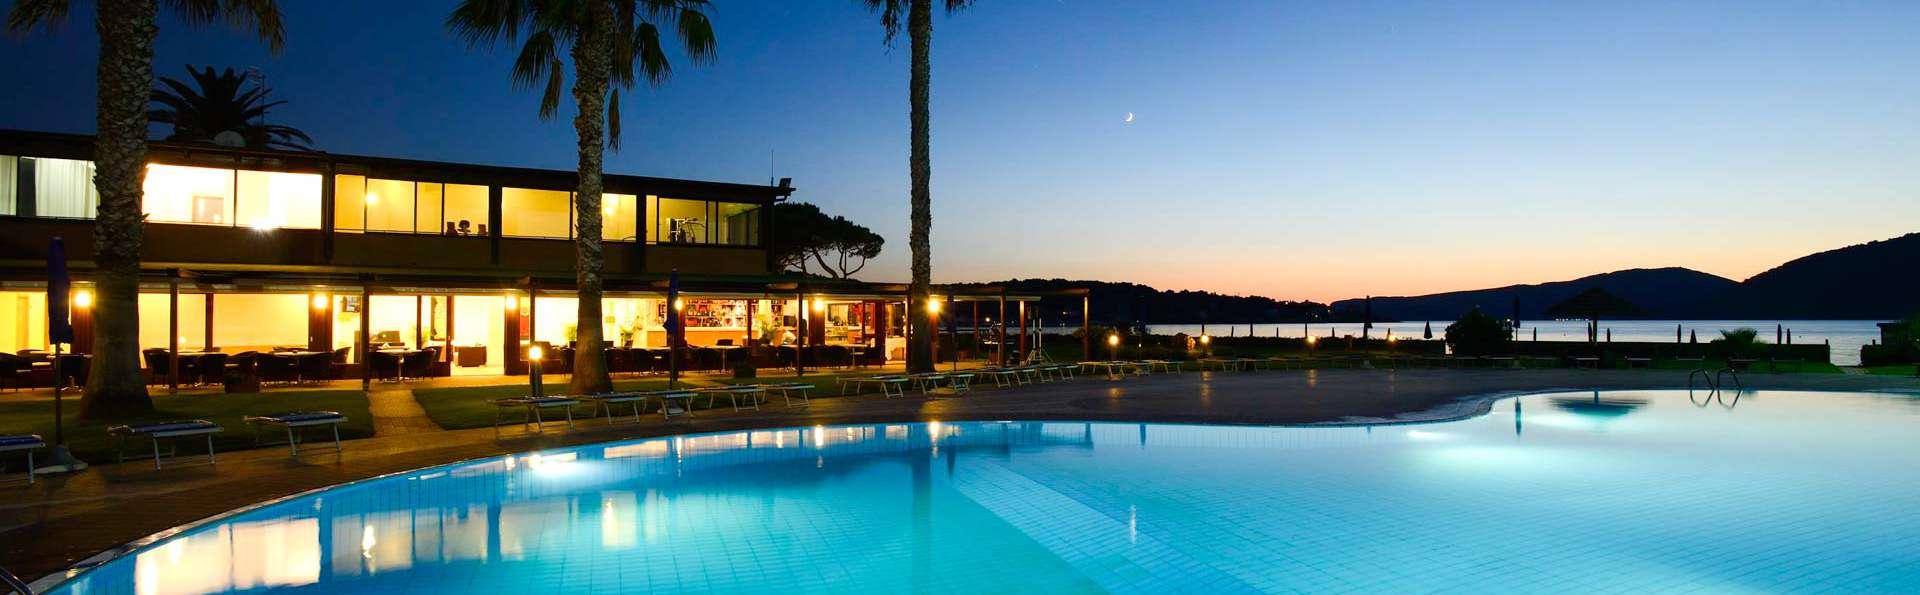 Hotel Corte Rosada (Adults Only) - Edit_POOL3.jpg